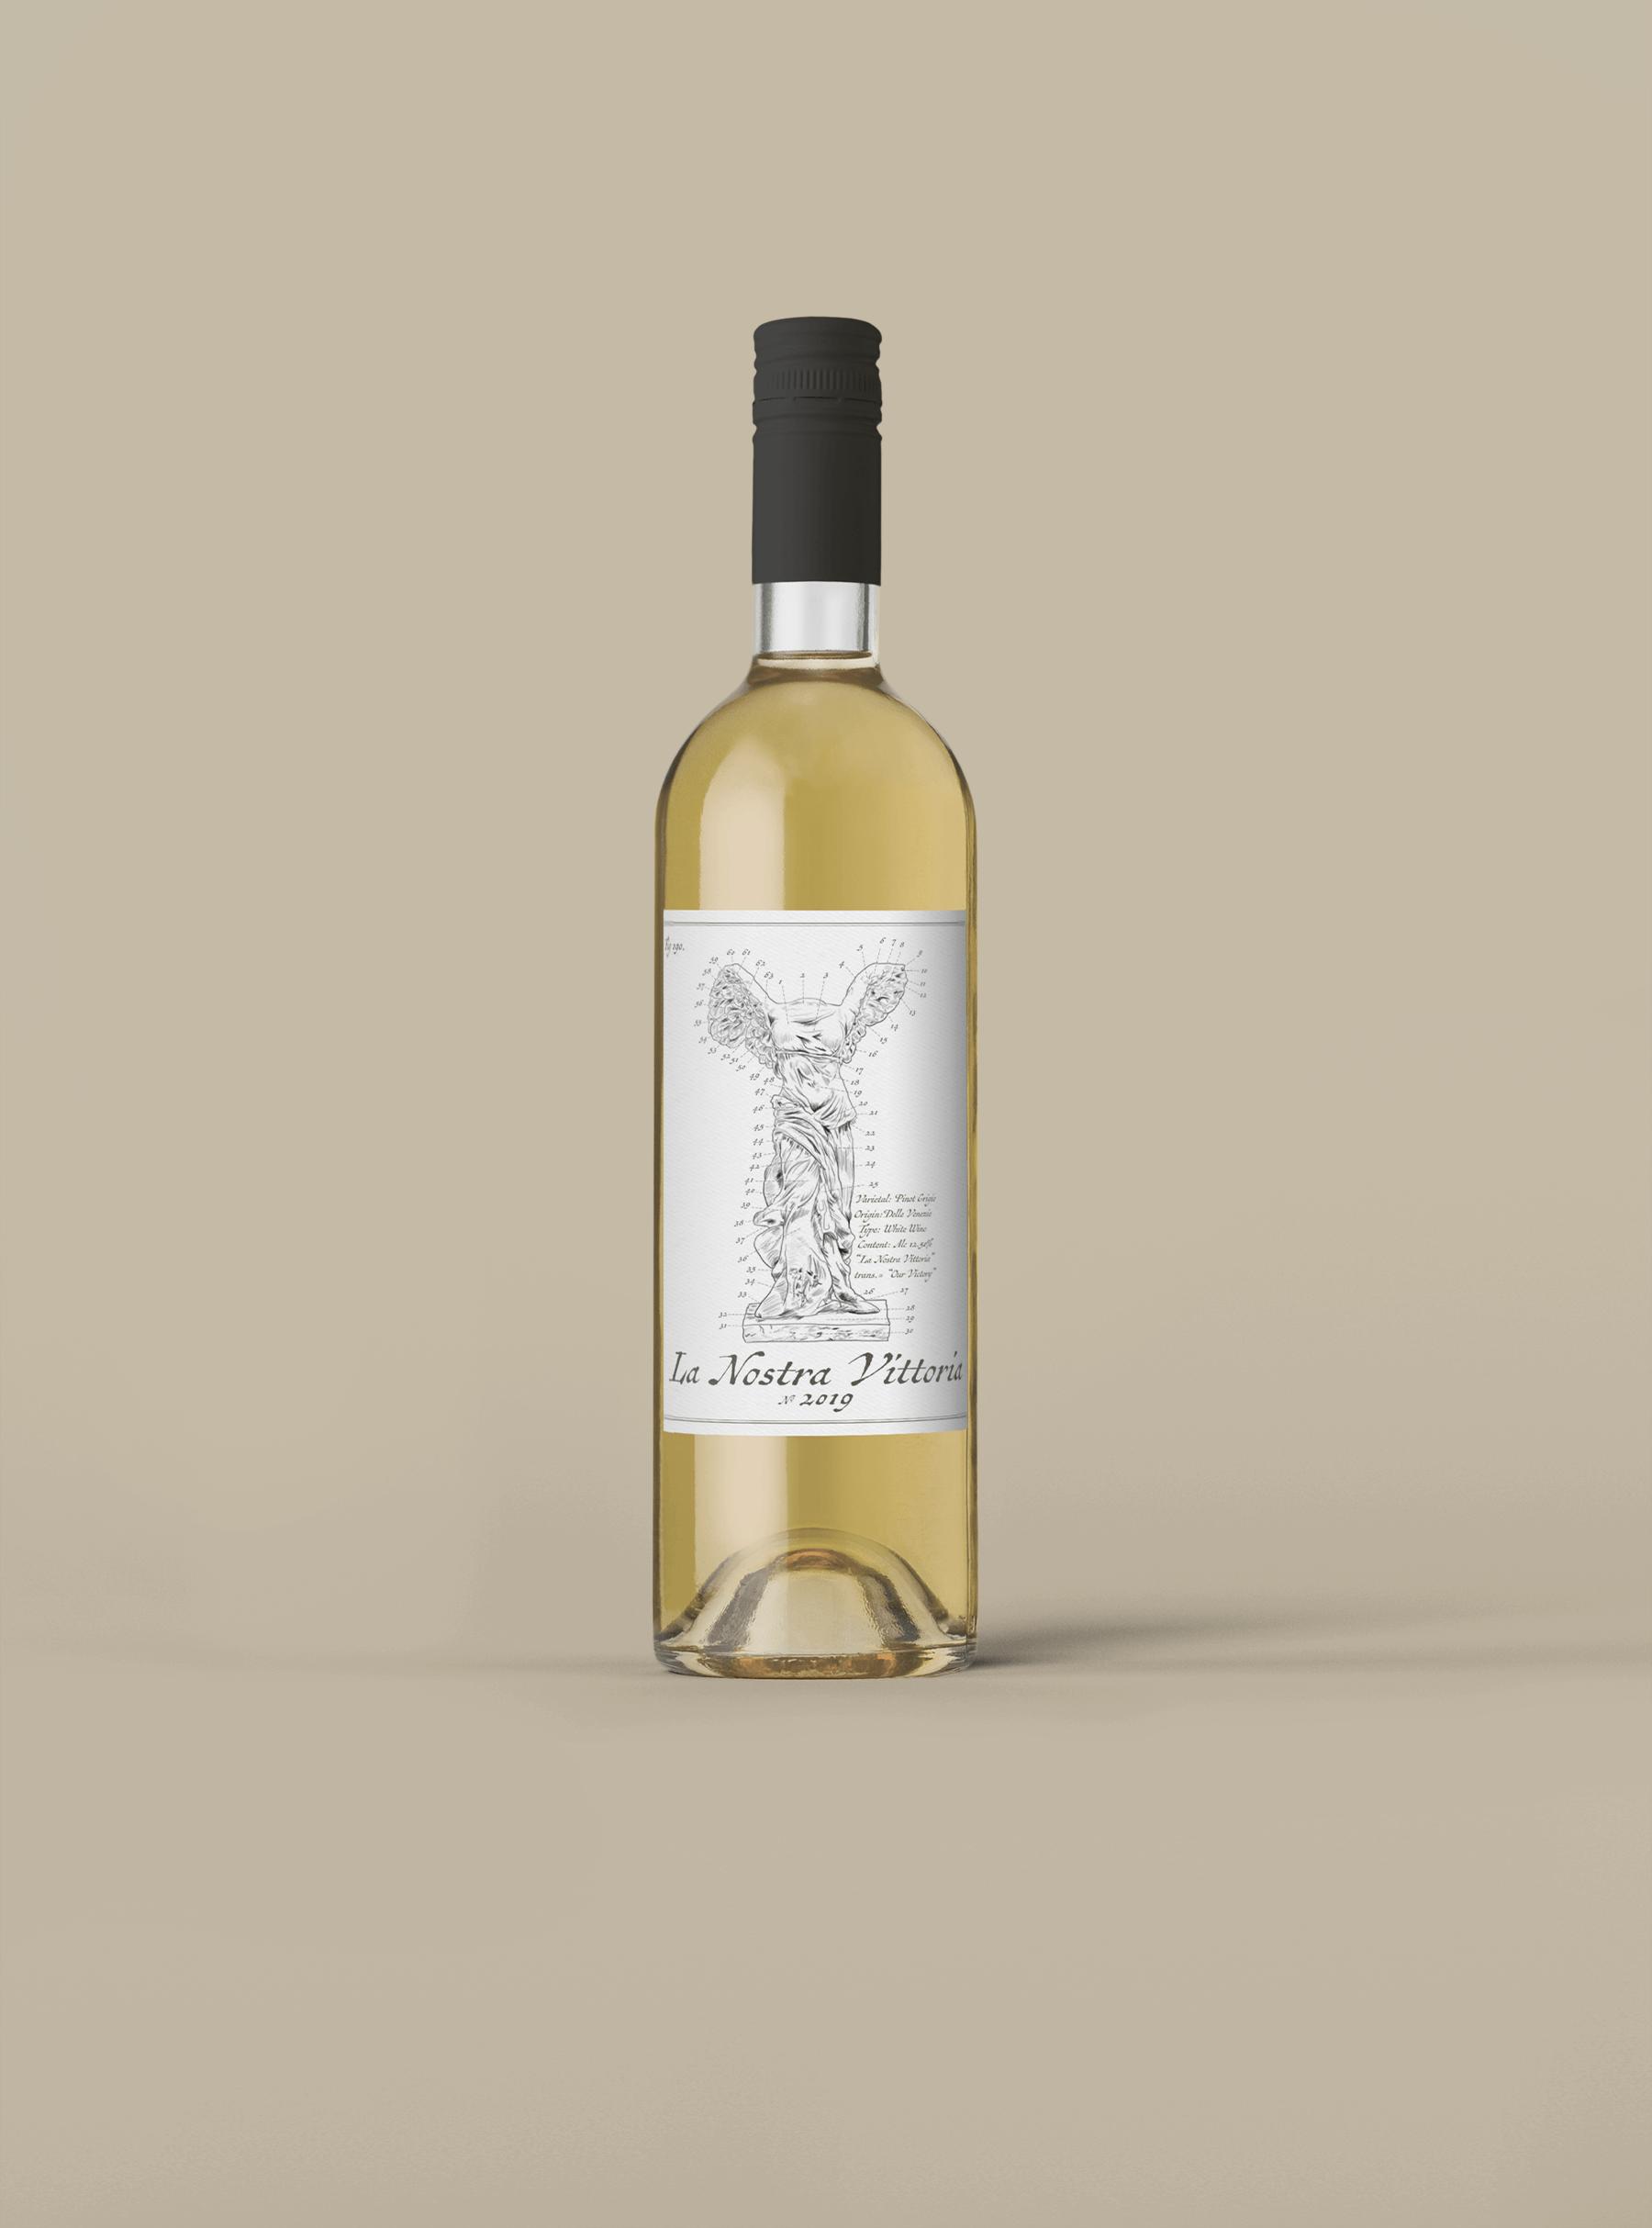 La Nostra Vittoria Delle Venezie IGT Pinot Grigio